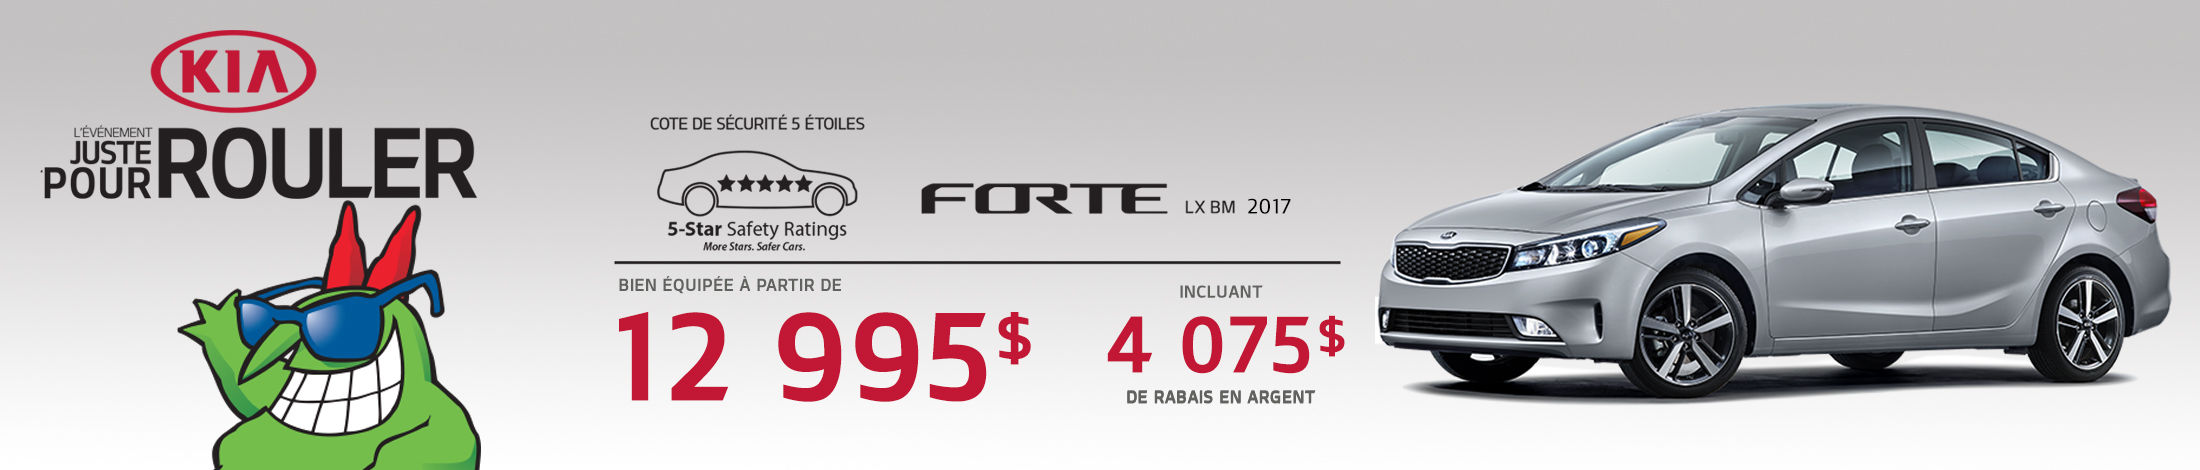 Kia Forte Promotion Juillet banner